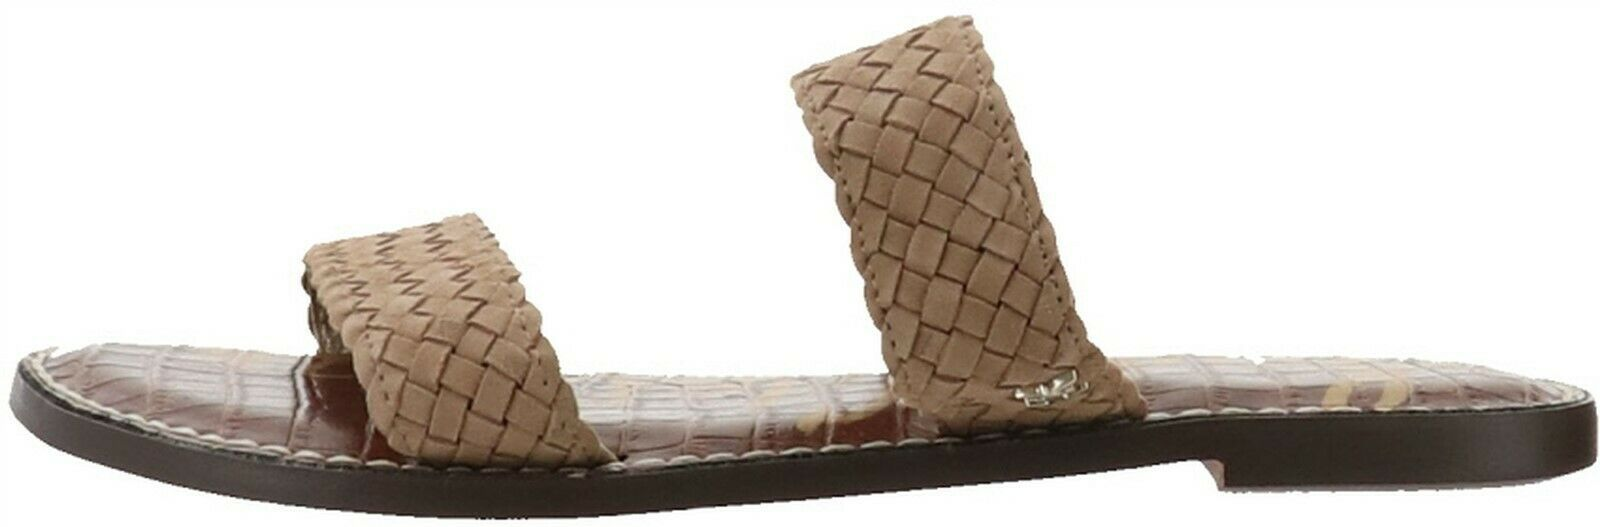 Sam Edelman Braided Double Strap Slide Sandals Gala 2 Oatmeal 8.5M NEW A365920 - $32.65